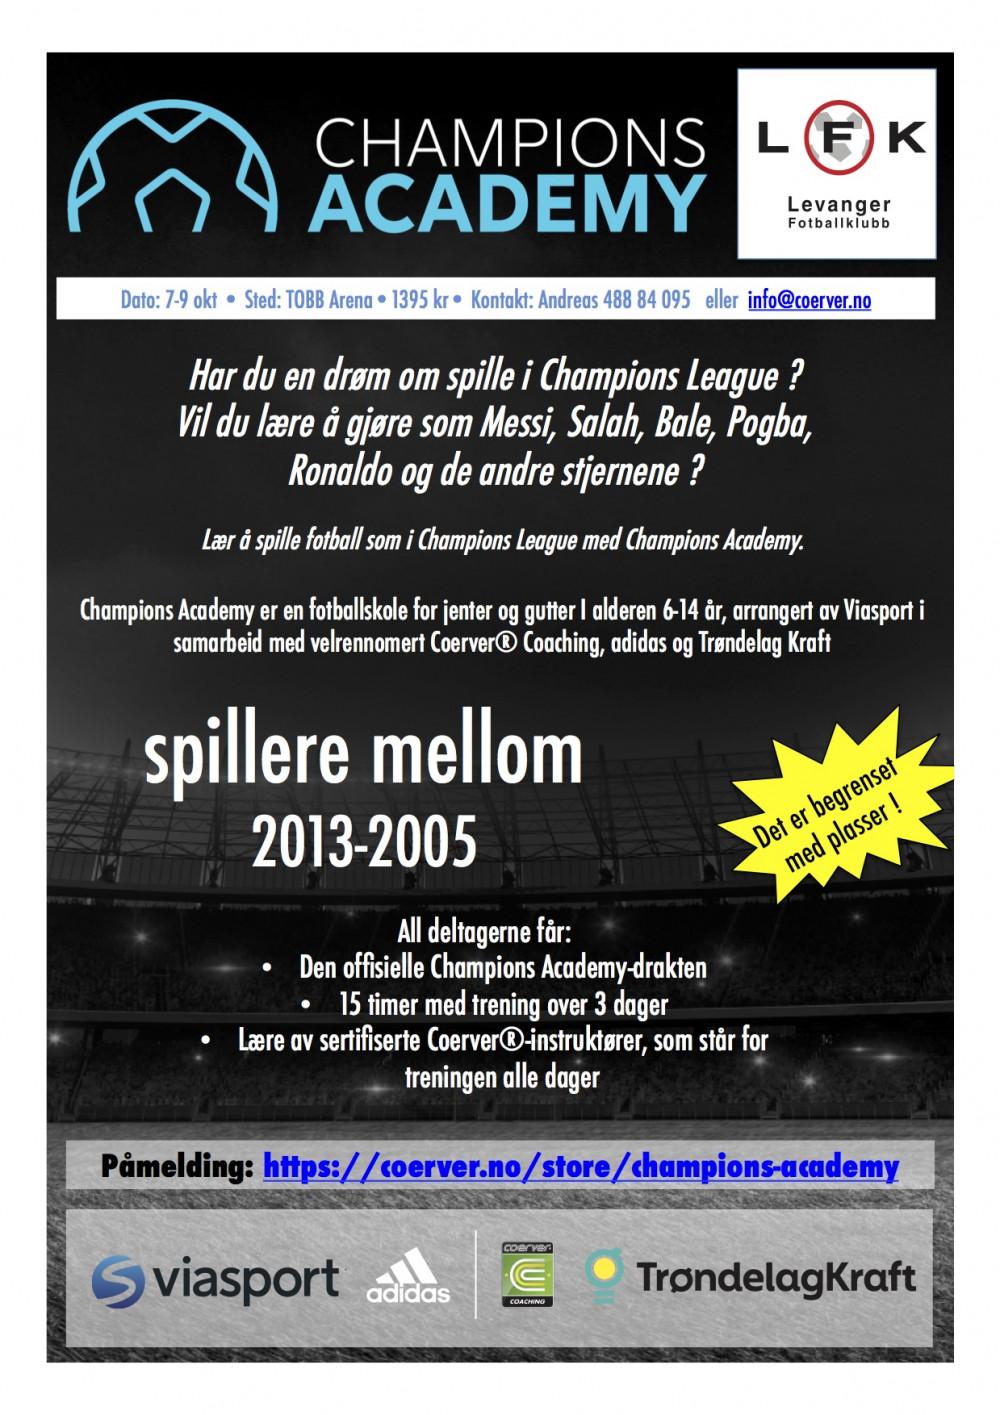 Champions Academy hos Levanger FK